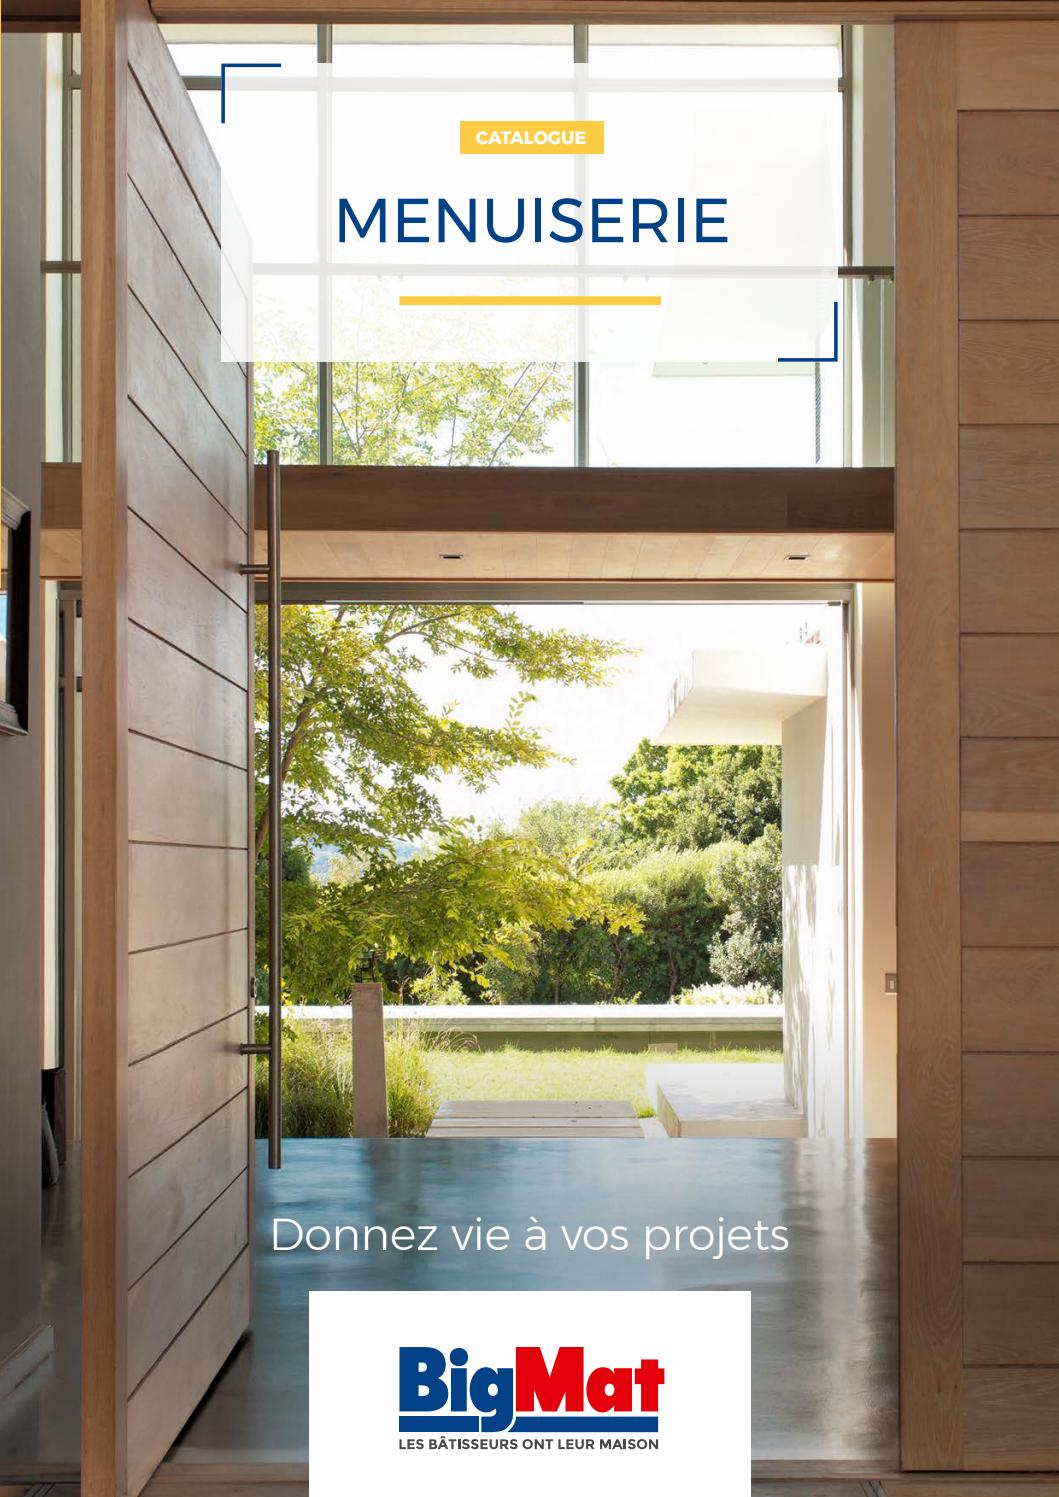 Catalogue Menuiserie Bigmat By Bigmatfrance Issuu